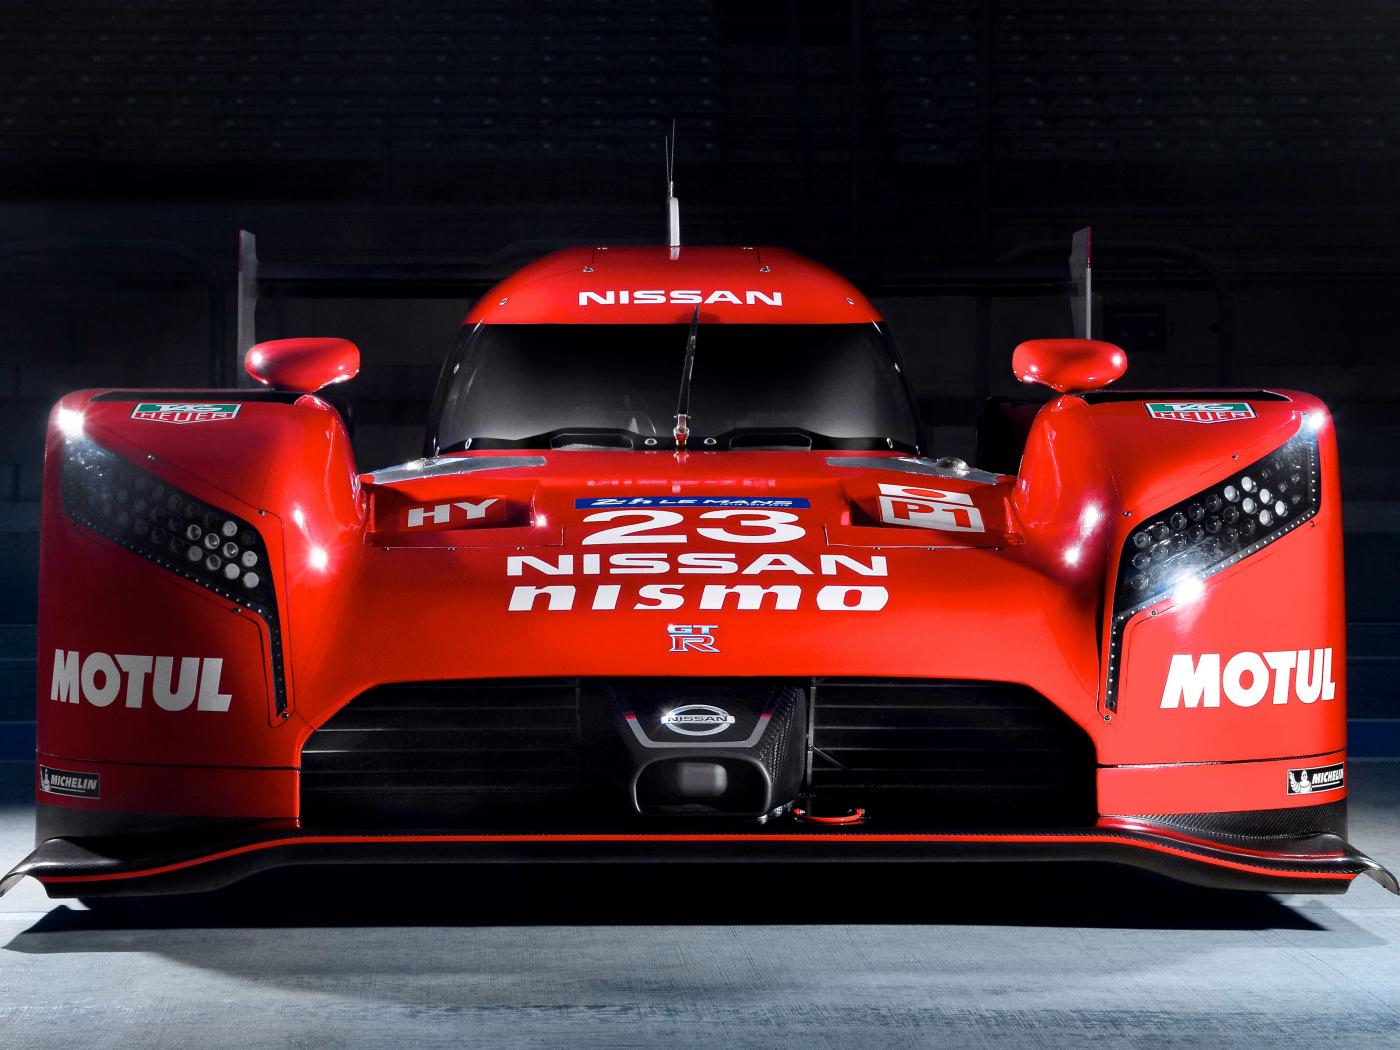 1400x1050 wallpaper Nissan GT-R LM Nismo prototype racing car